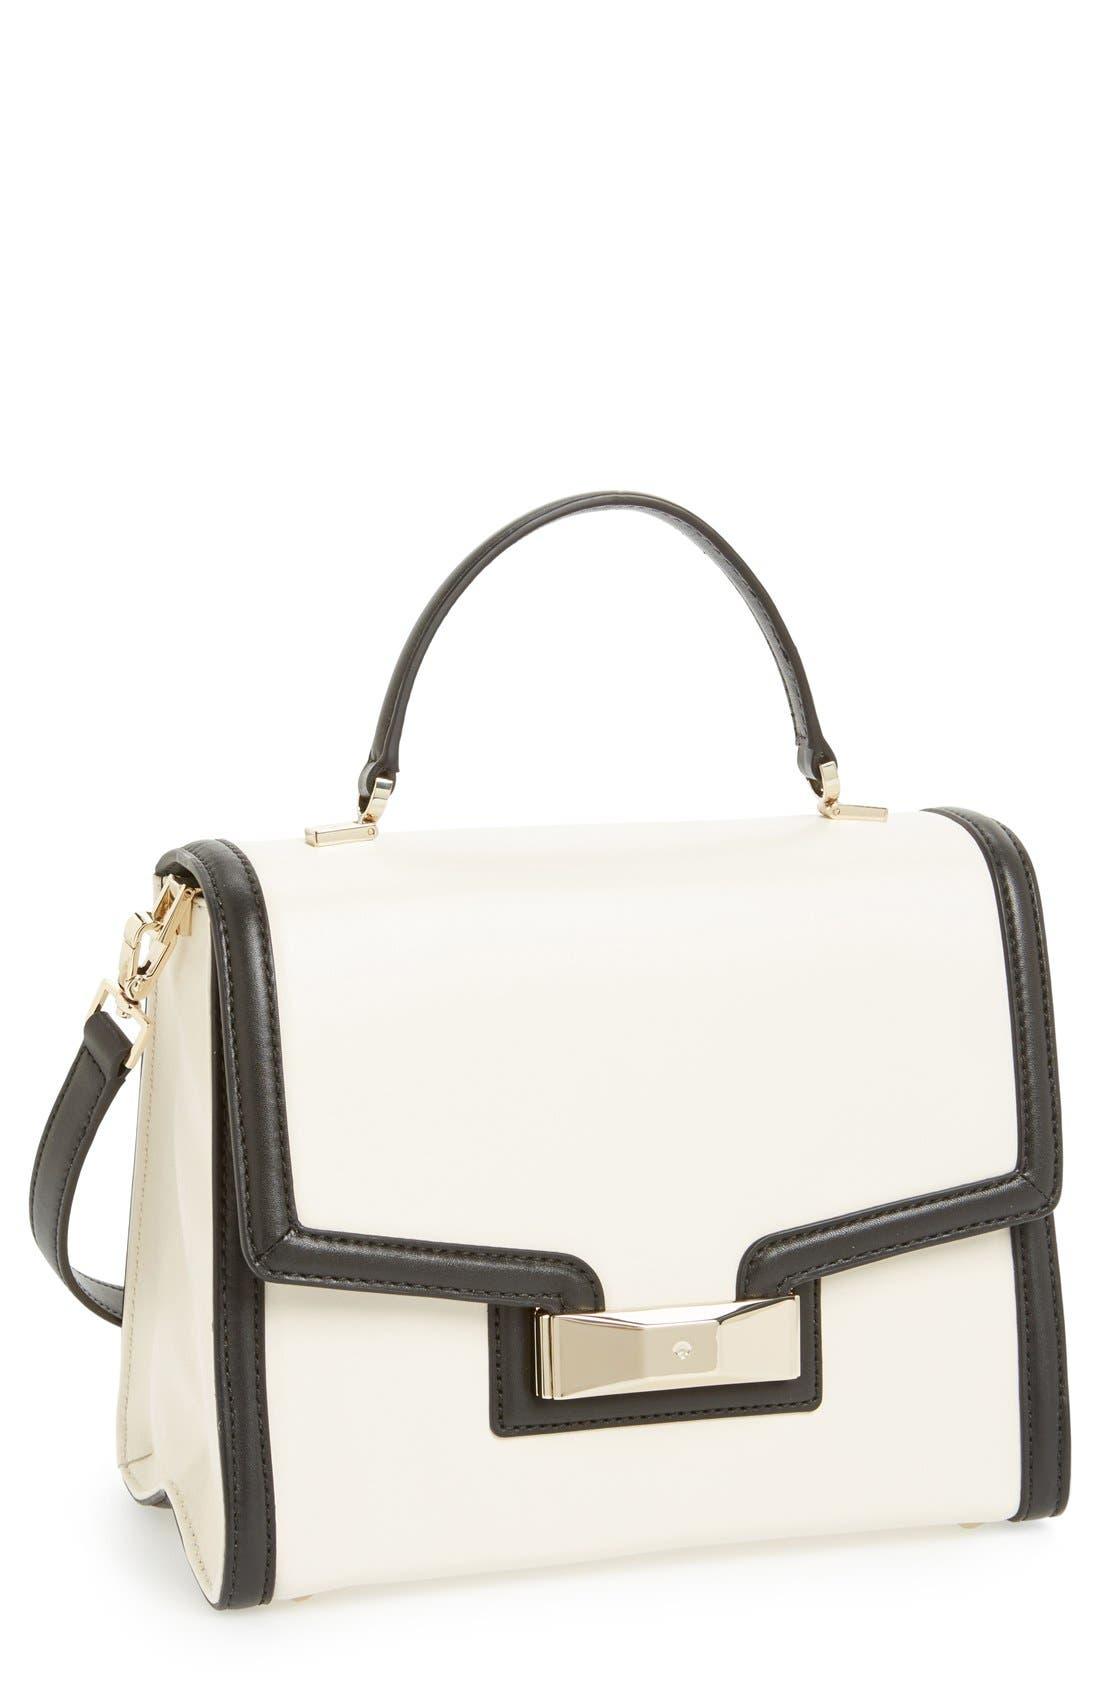 Alternate Image 1 Selected - kate spade new york 'carroll park - penelope' leather satchel